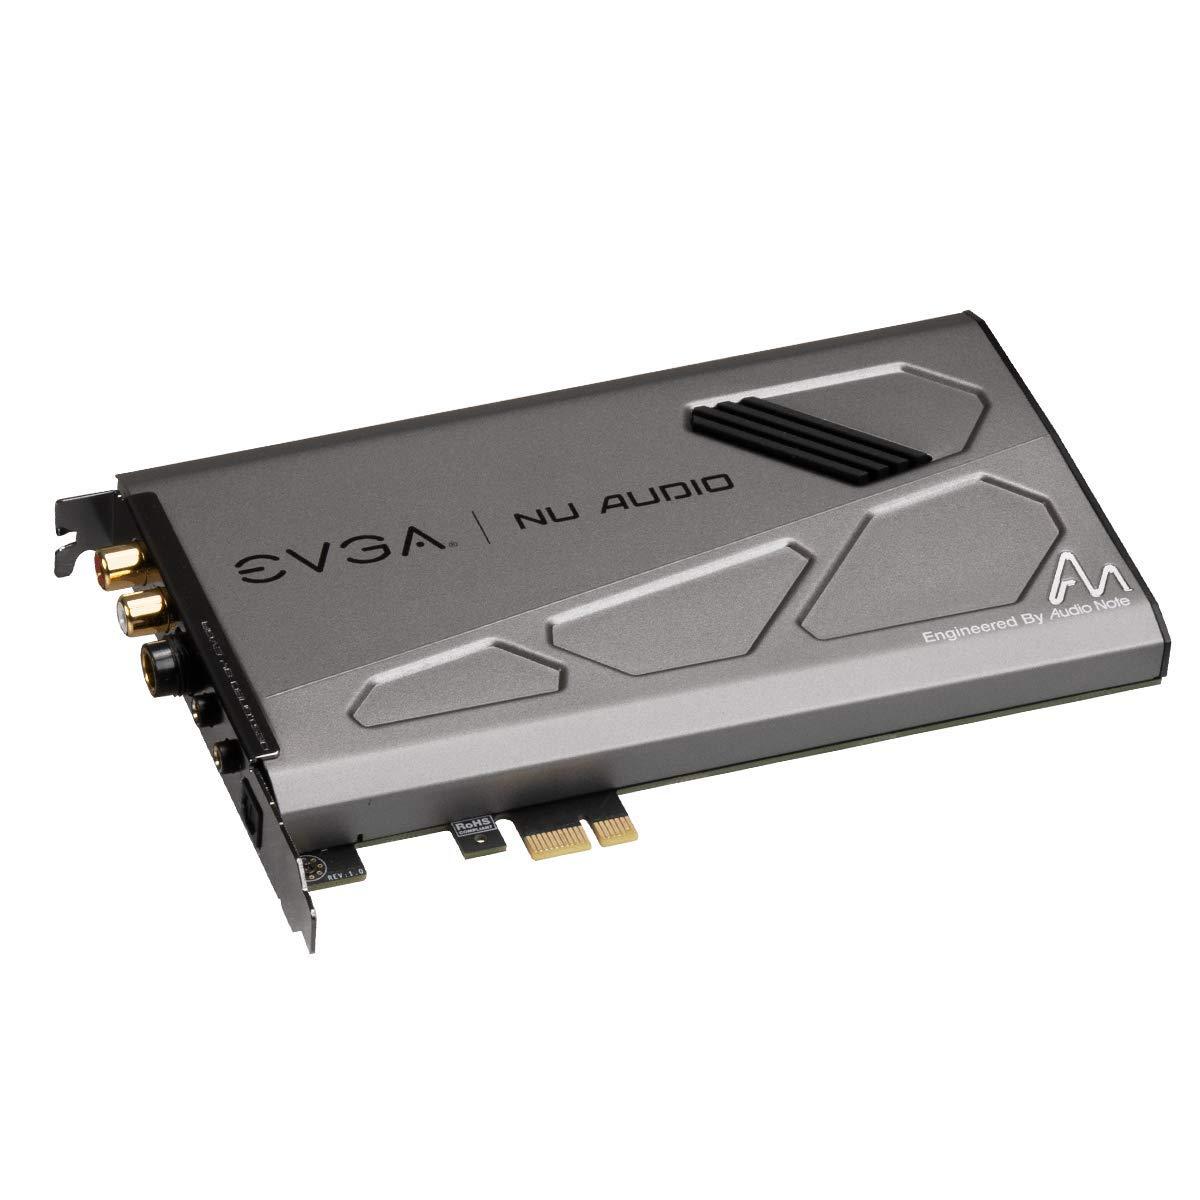 EVGA Nu Audio Card, 712-P1-AN01-KR, Lifelike Audio, PCIe, RGB LED, Designed with Audio Note (UK) by EVGA (Image #4)